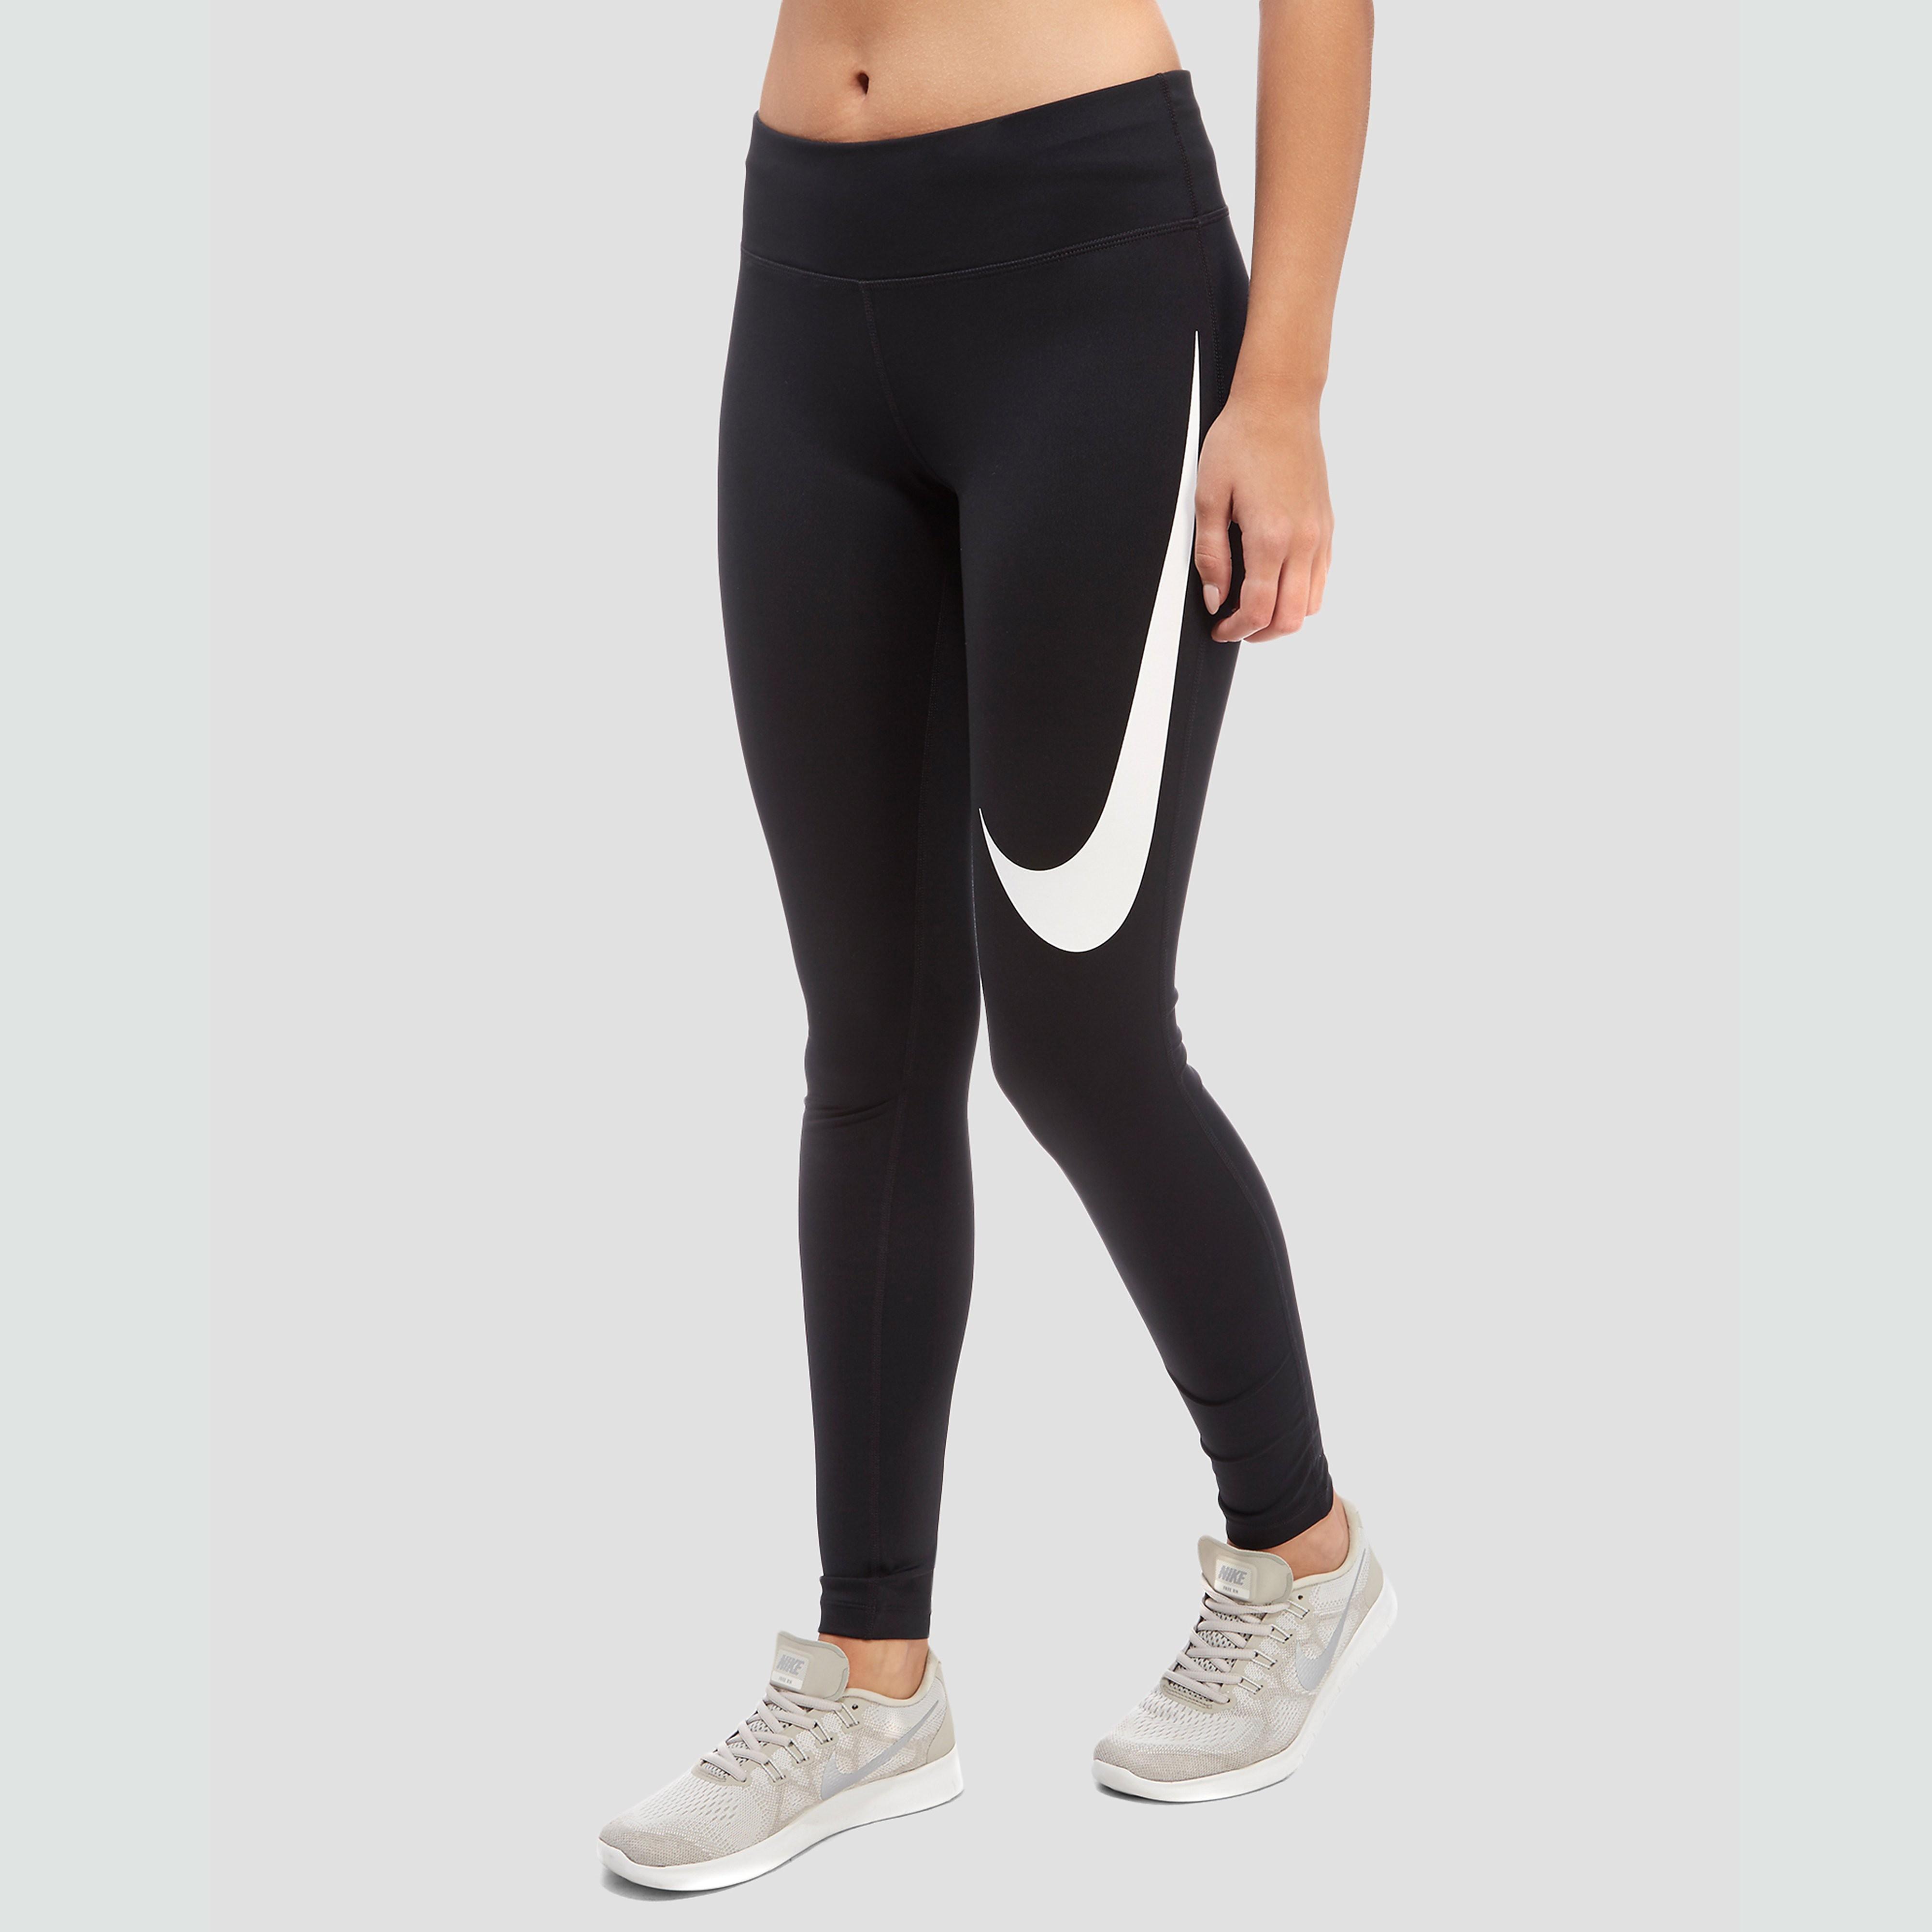 Nike Swoosh Power Essential Women's Running Tights